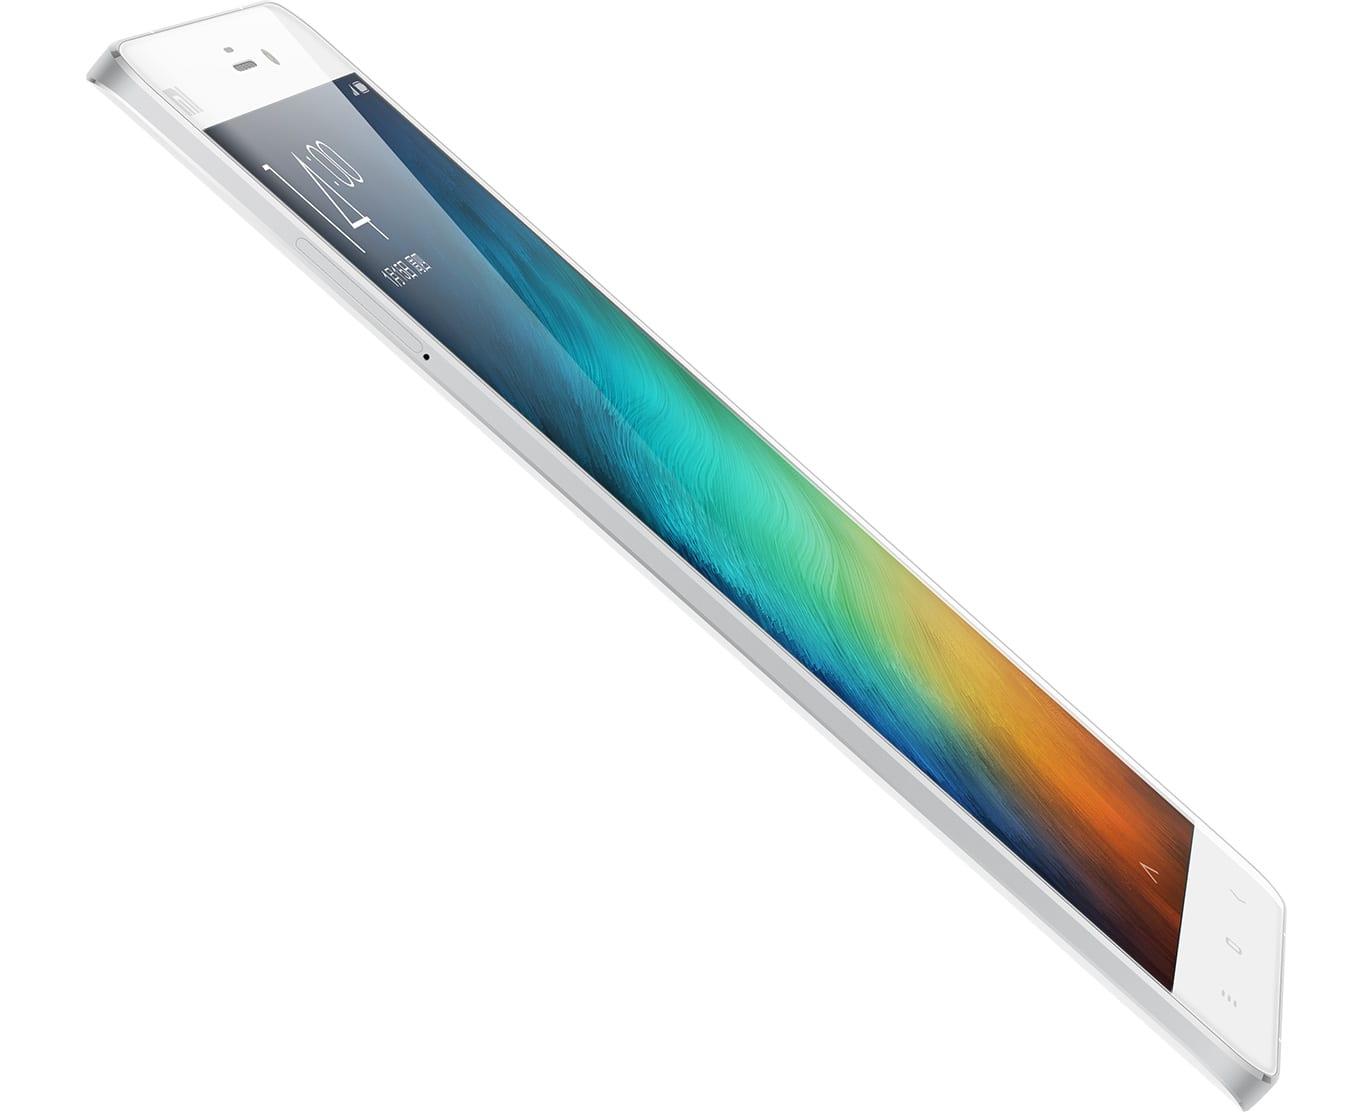 Mi Note Pro Samsung Galaxy Note 4 (1)